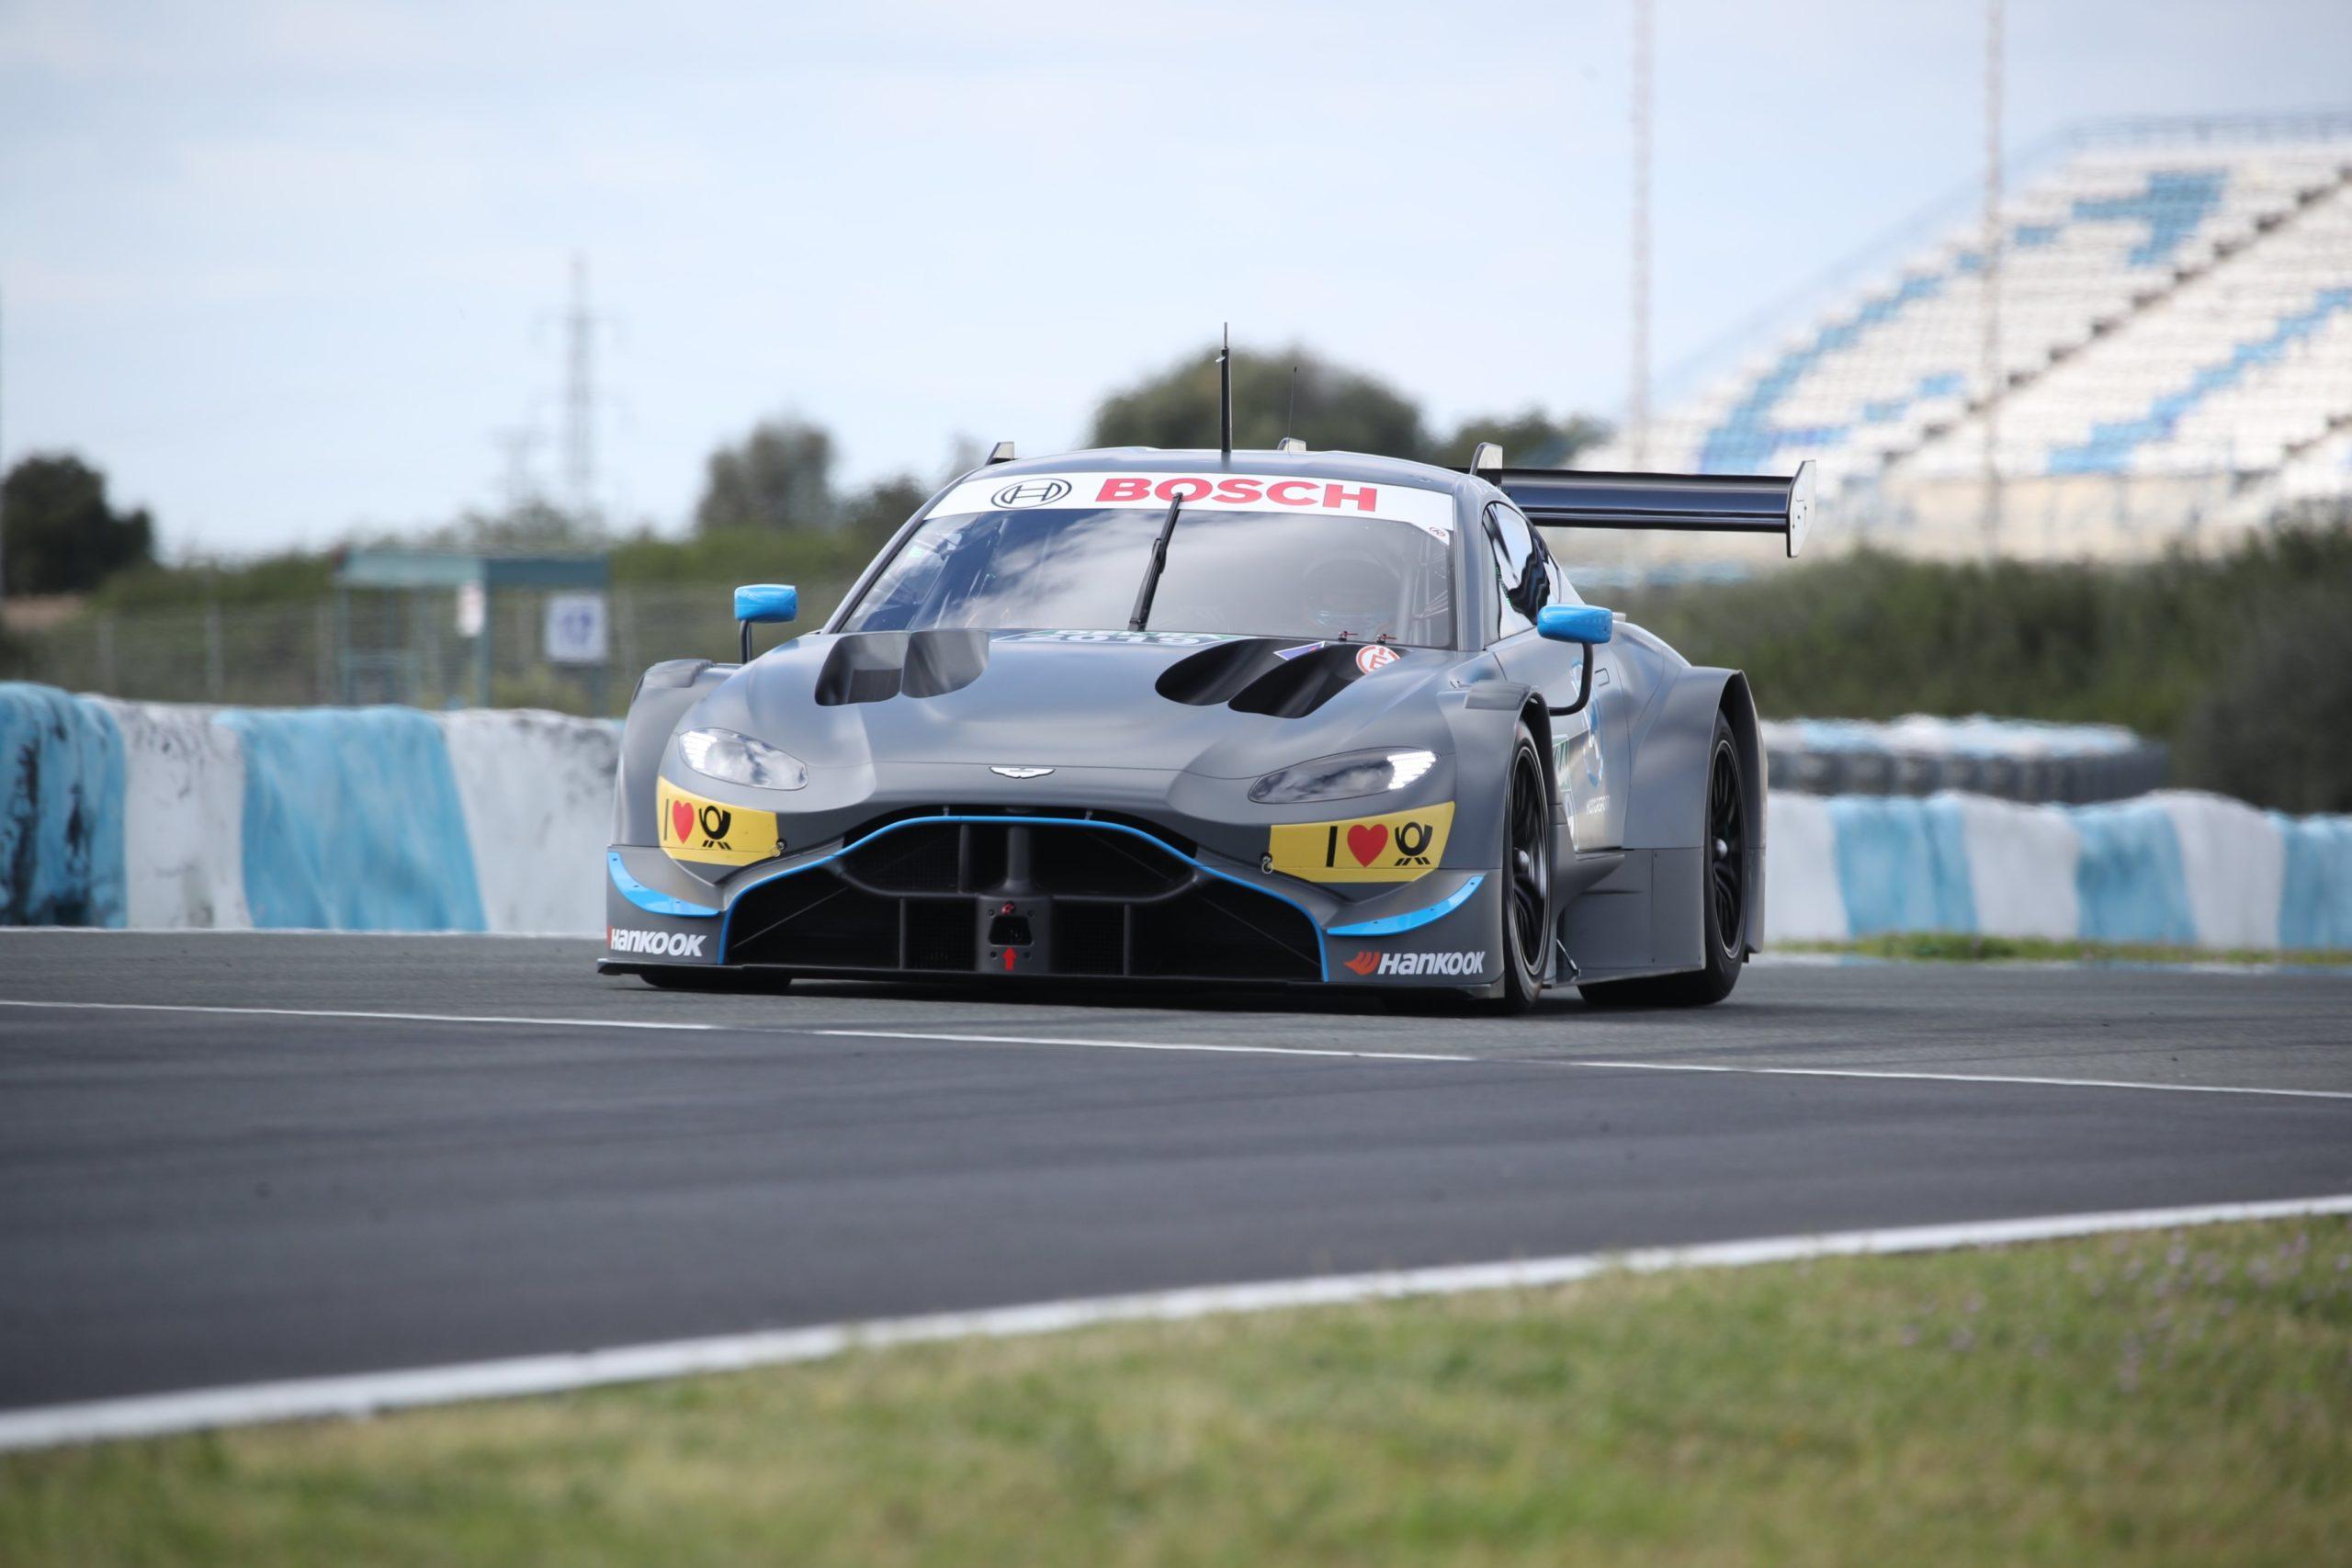 Aston Martina